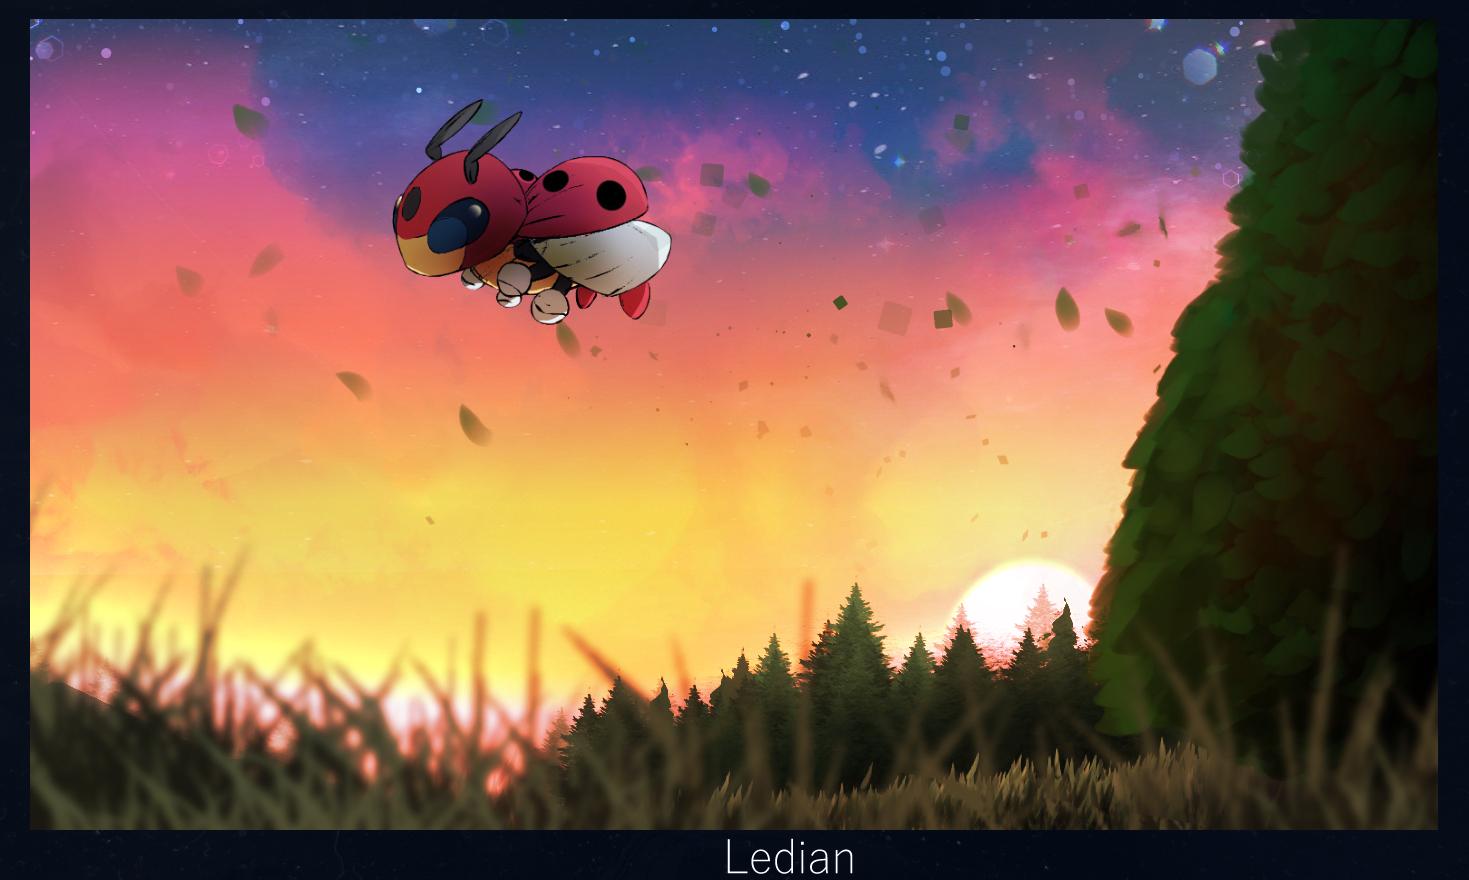 Ledian